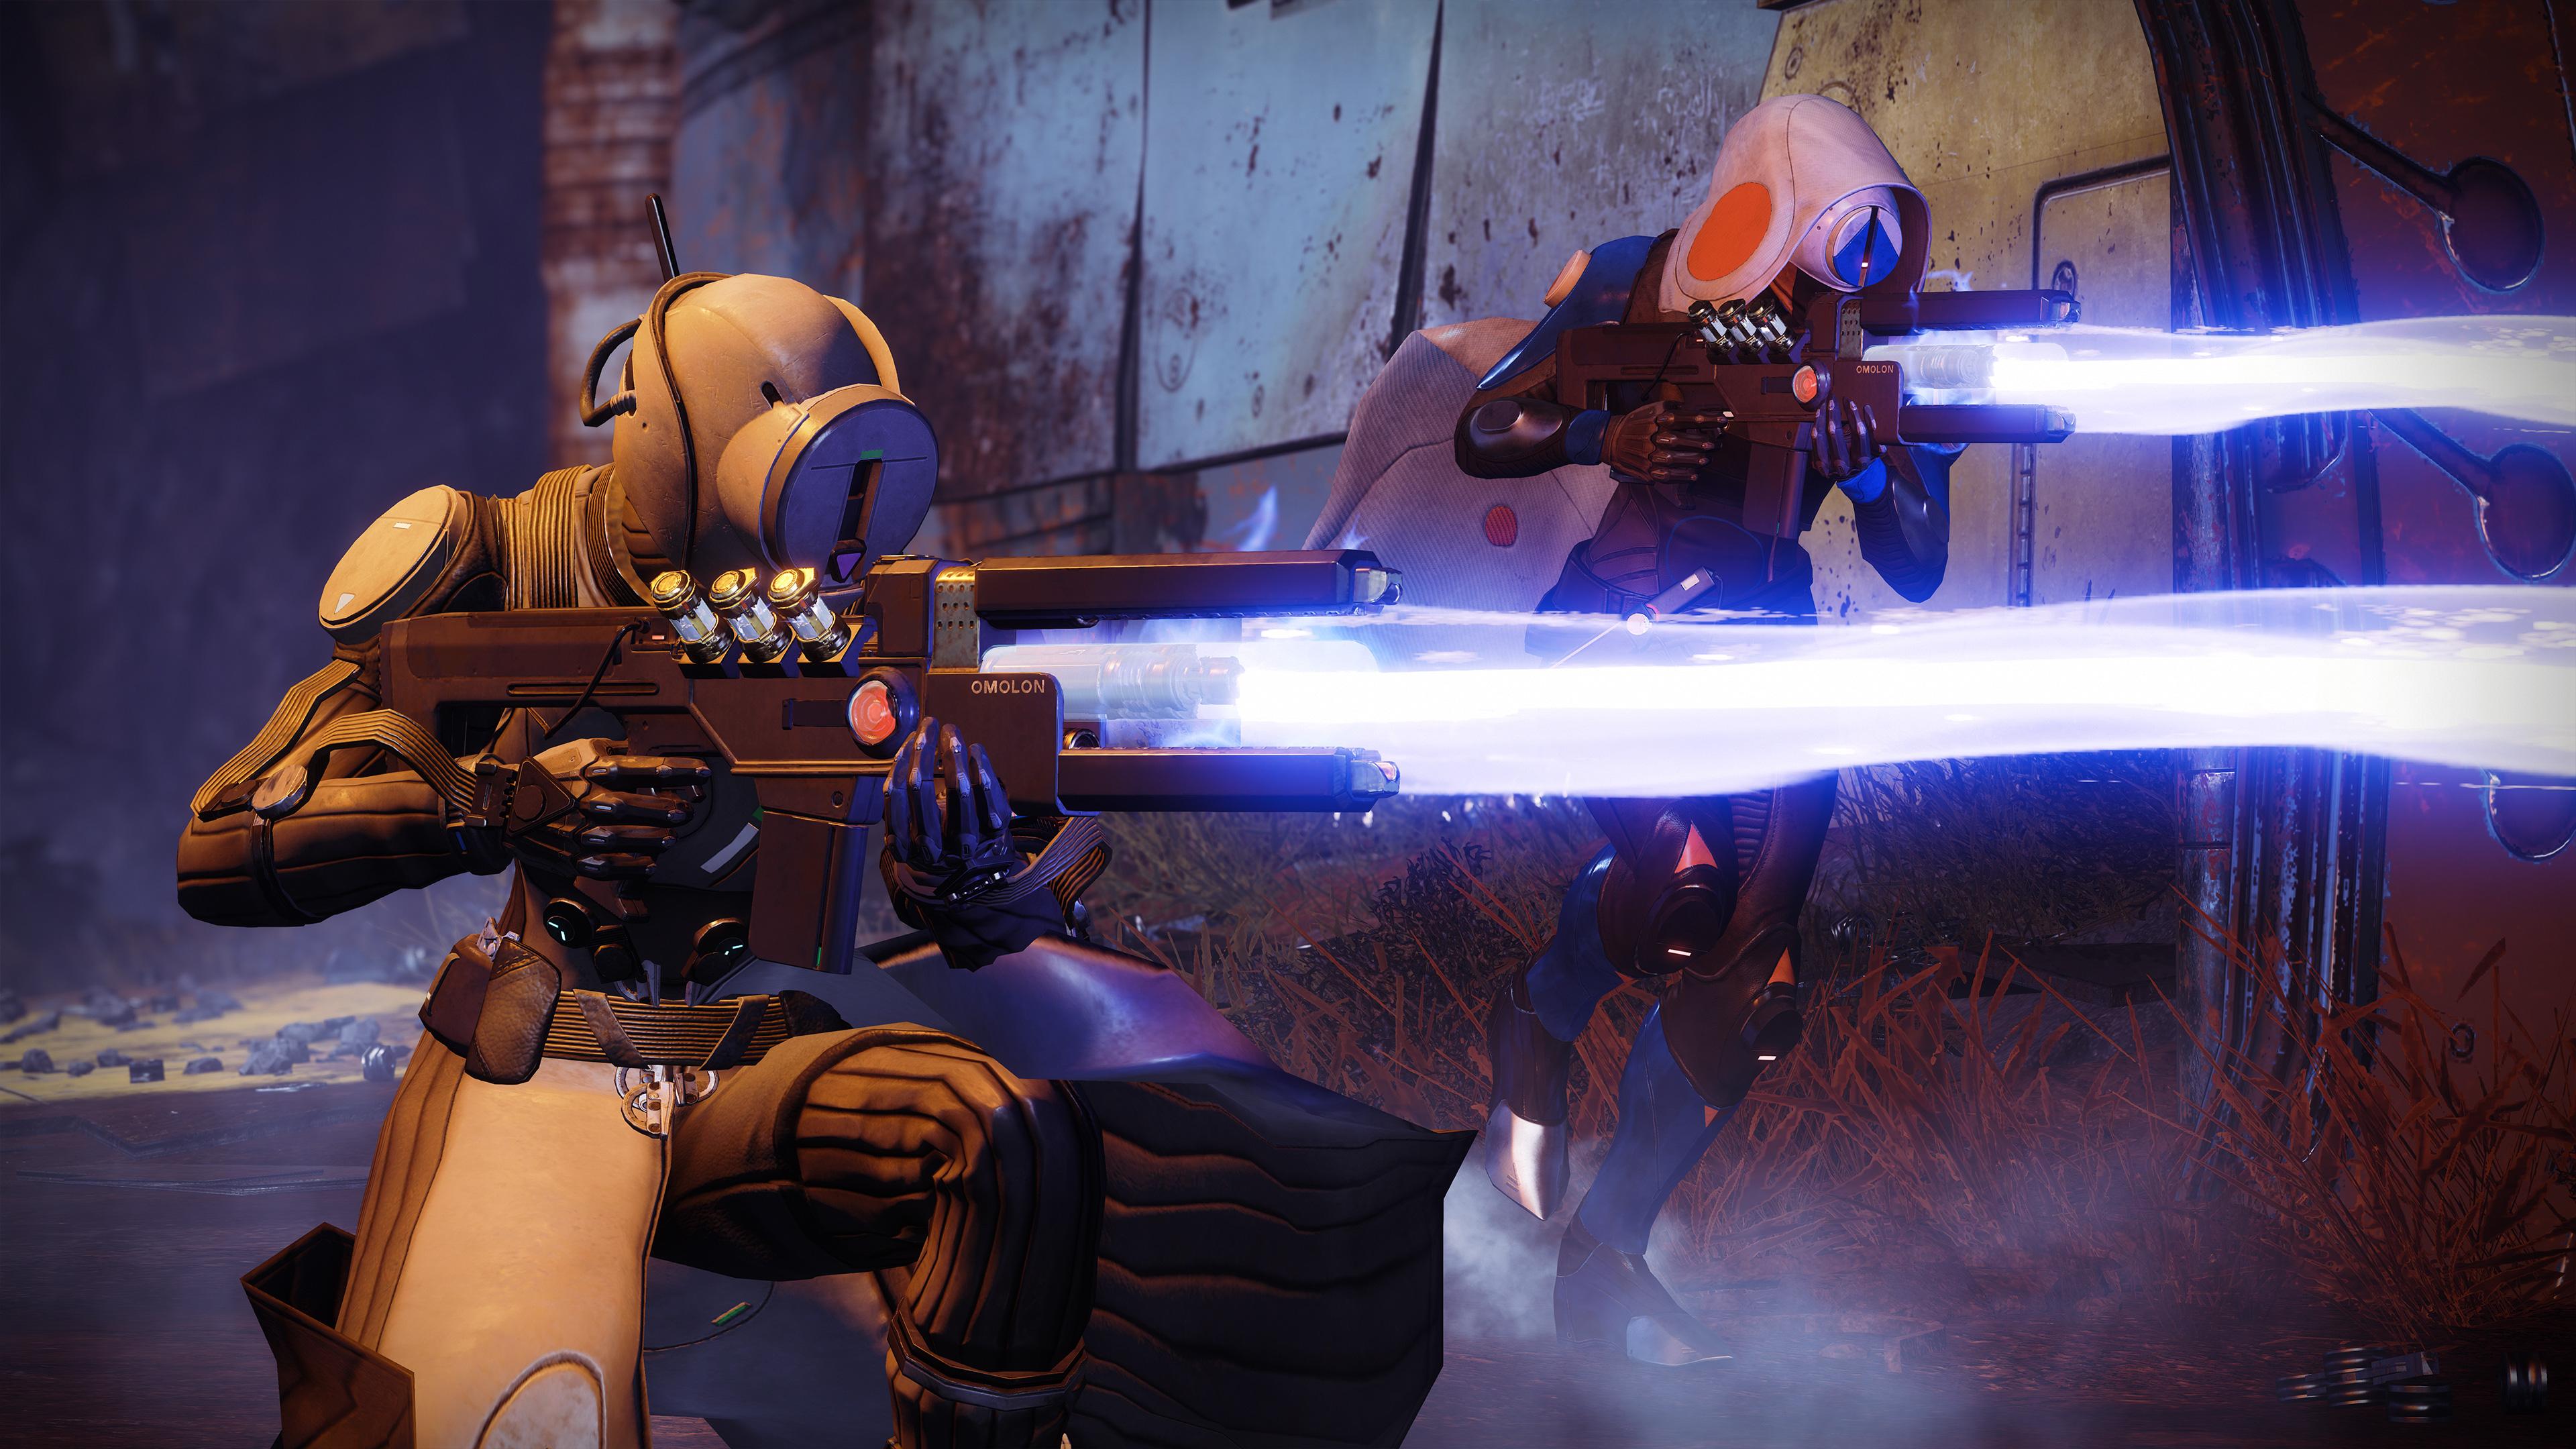 Destiny 2: Forsaken's PS4 exclusives detailed: strike, exotic weapon